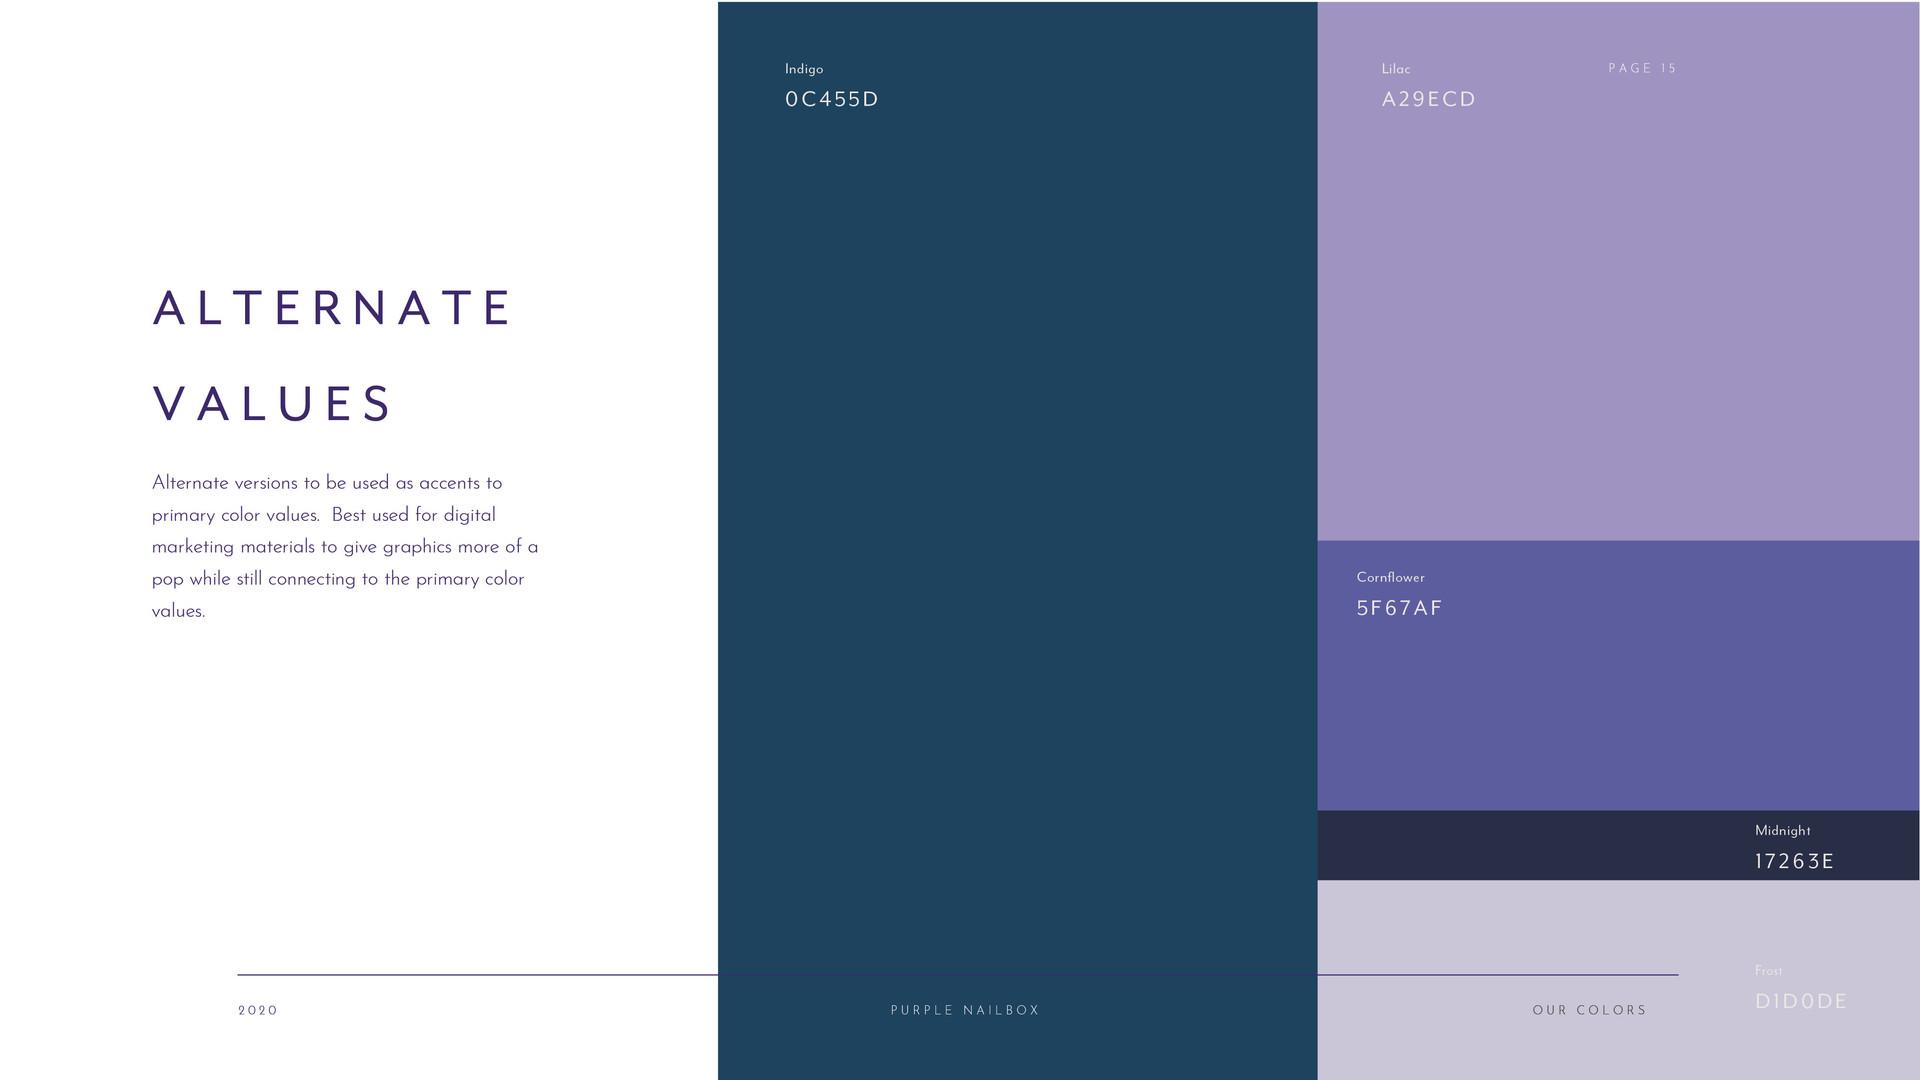 The Purple Nailbox Brandind Deck_R3-15.j